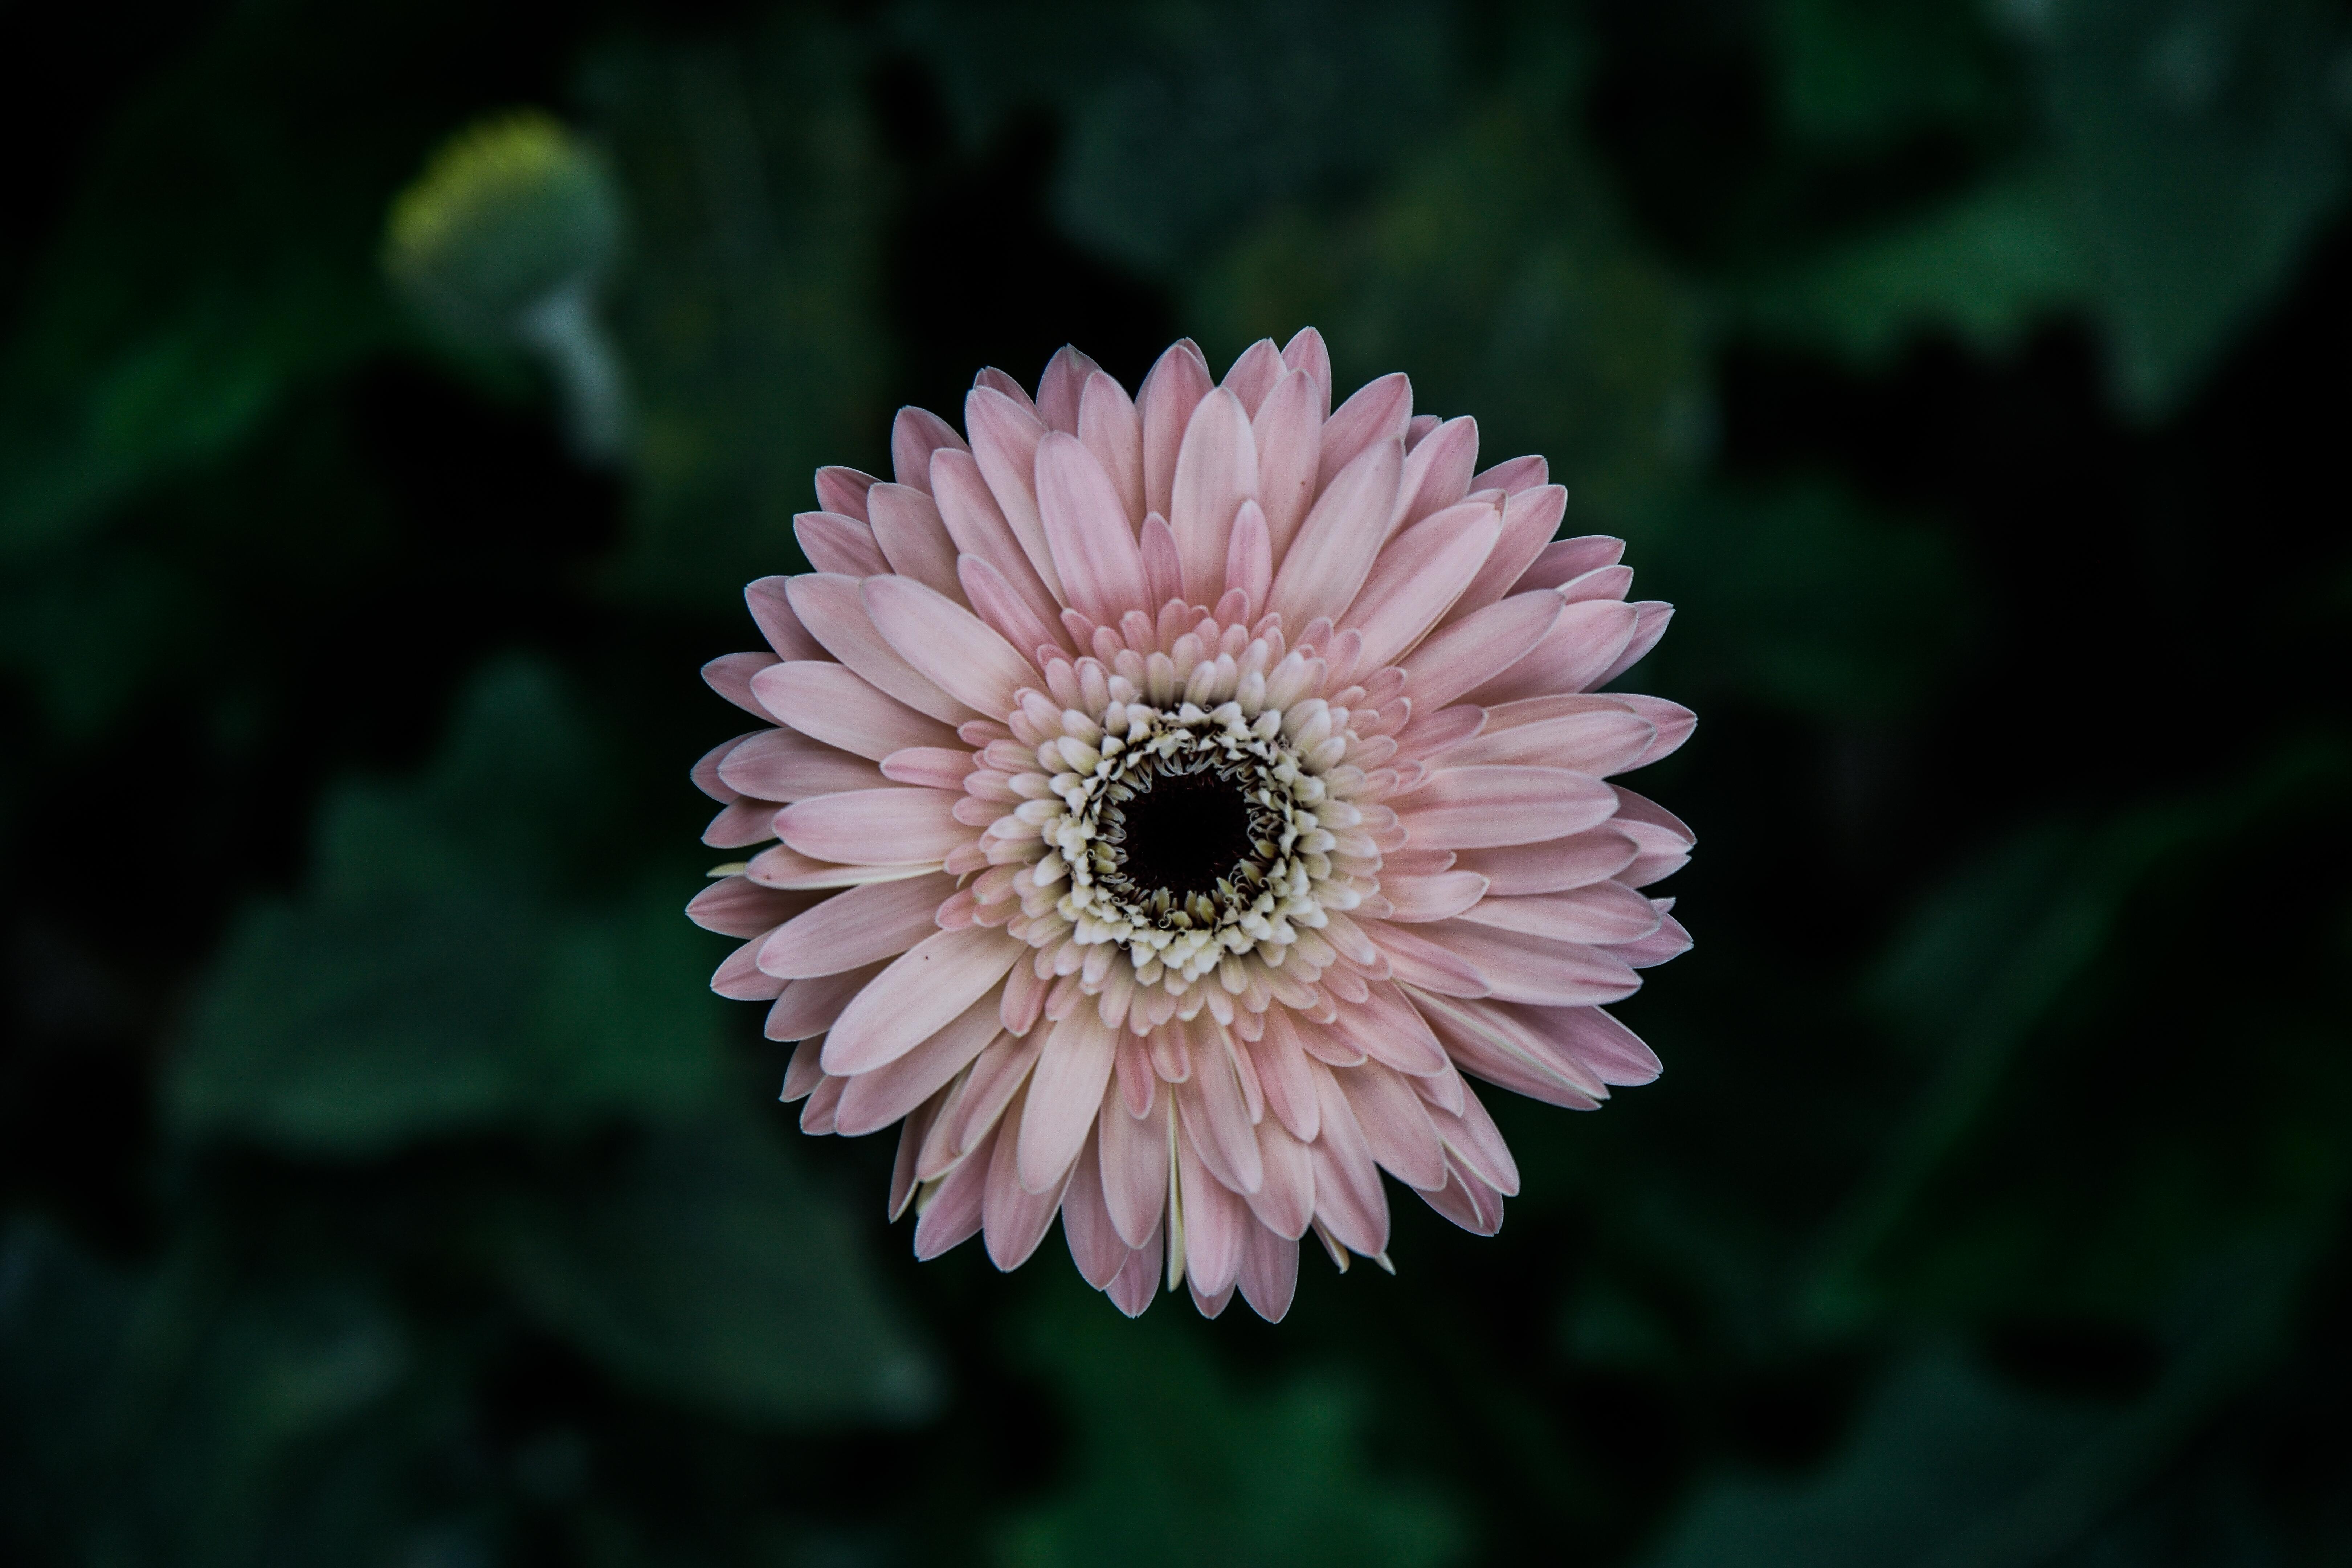 free stock photo of closeup daisy flowers